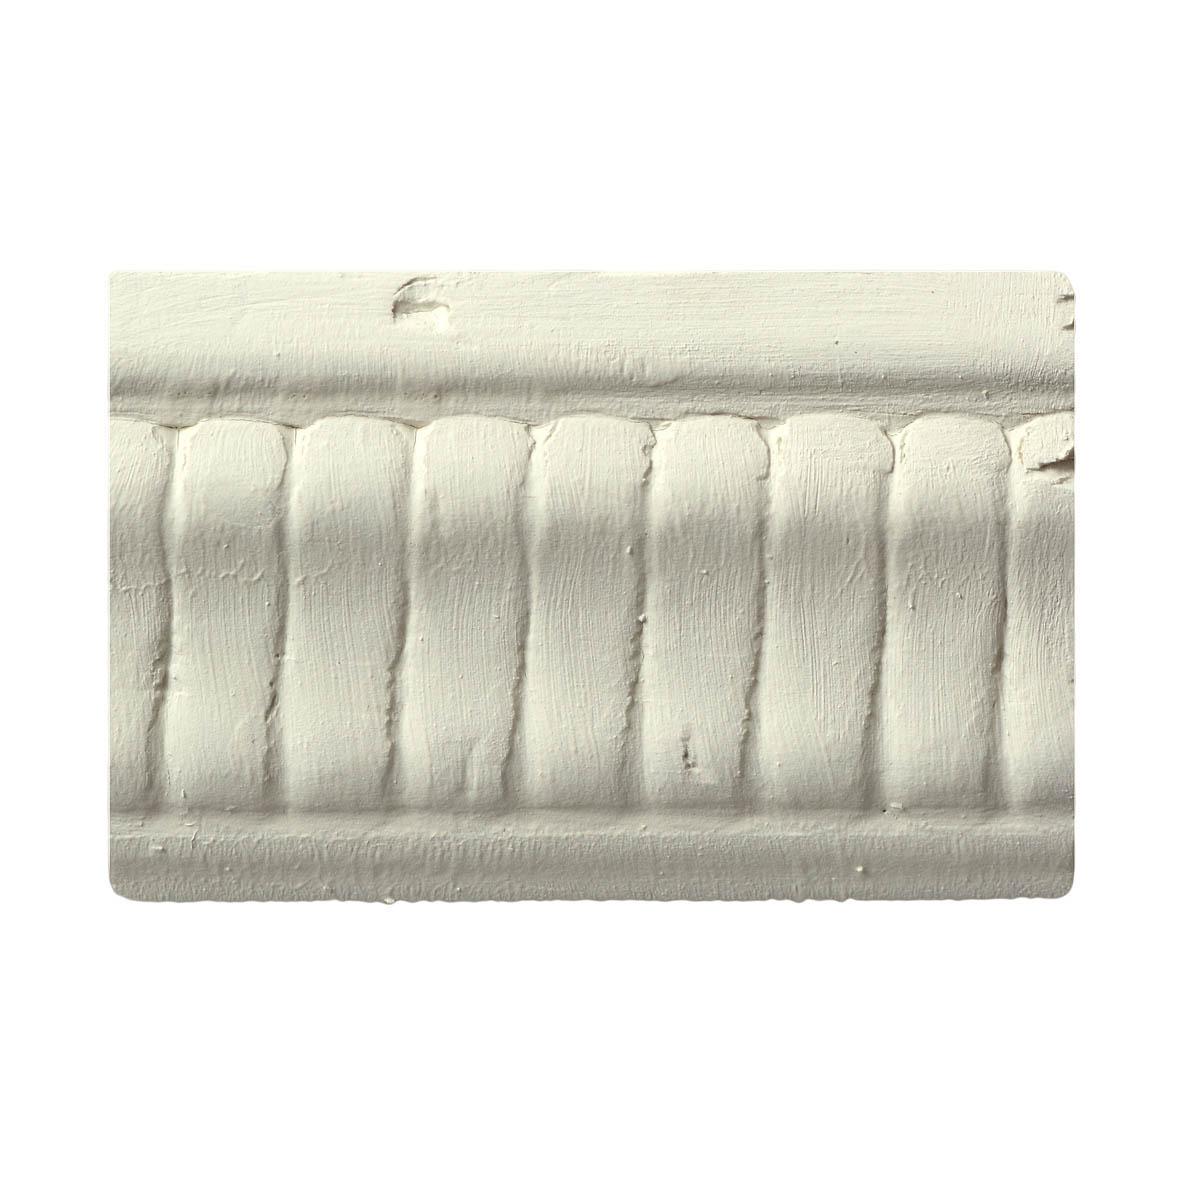 Waverly ® Inspirations Chalk Finish Acrylic Paint - Plaster, 2 oz. - 60737E